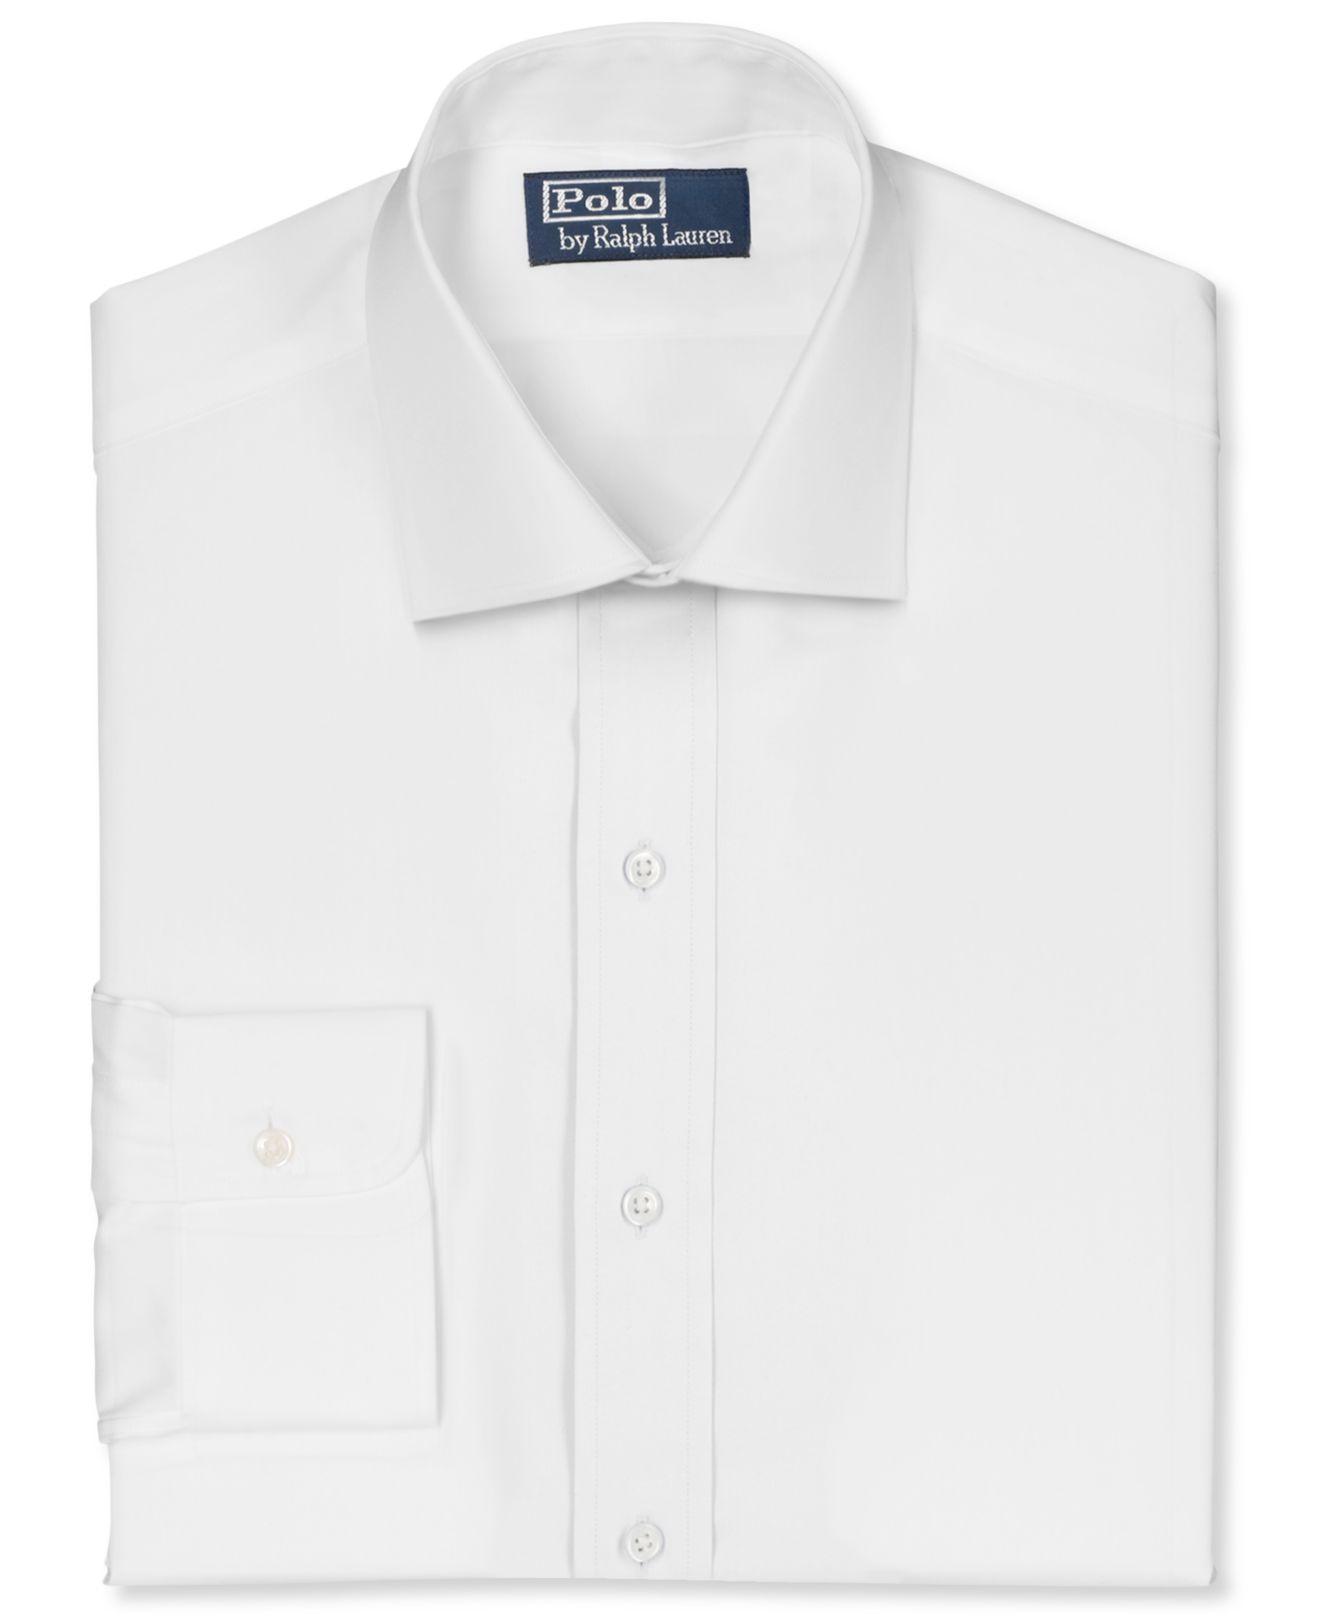 d959c18f32 Polo Ralph Lauren 80's English Poplin Regent Dress Shirt in White ...